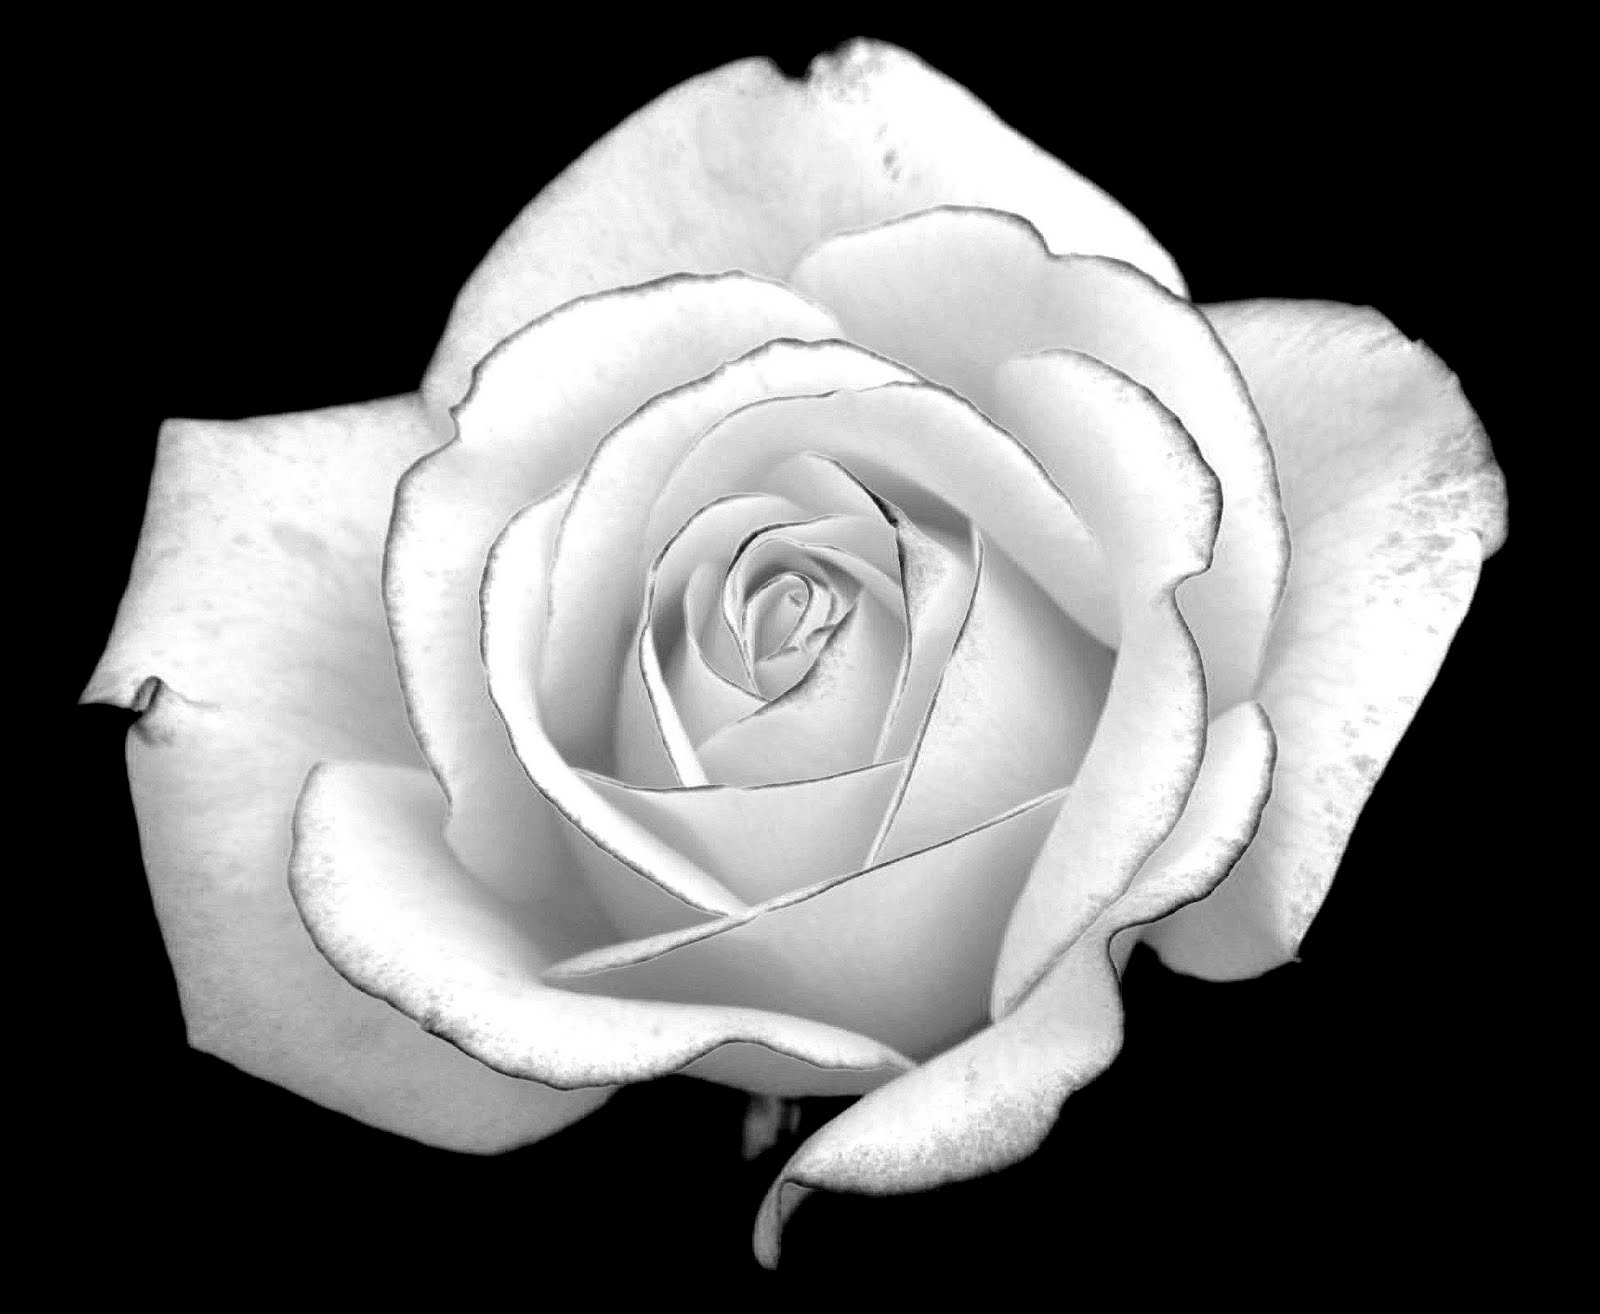 images of animated white roses - photo #14